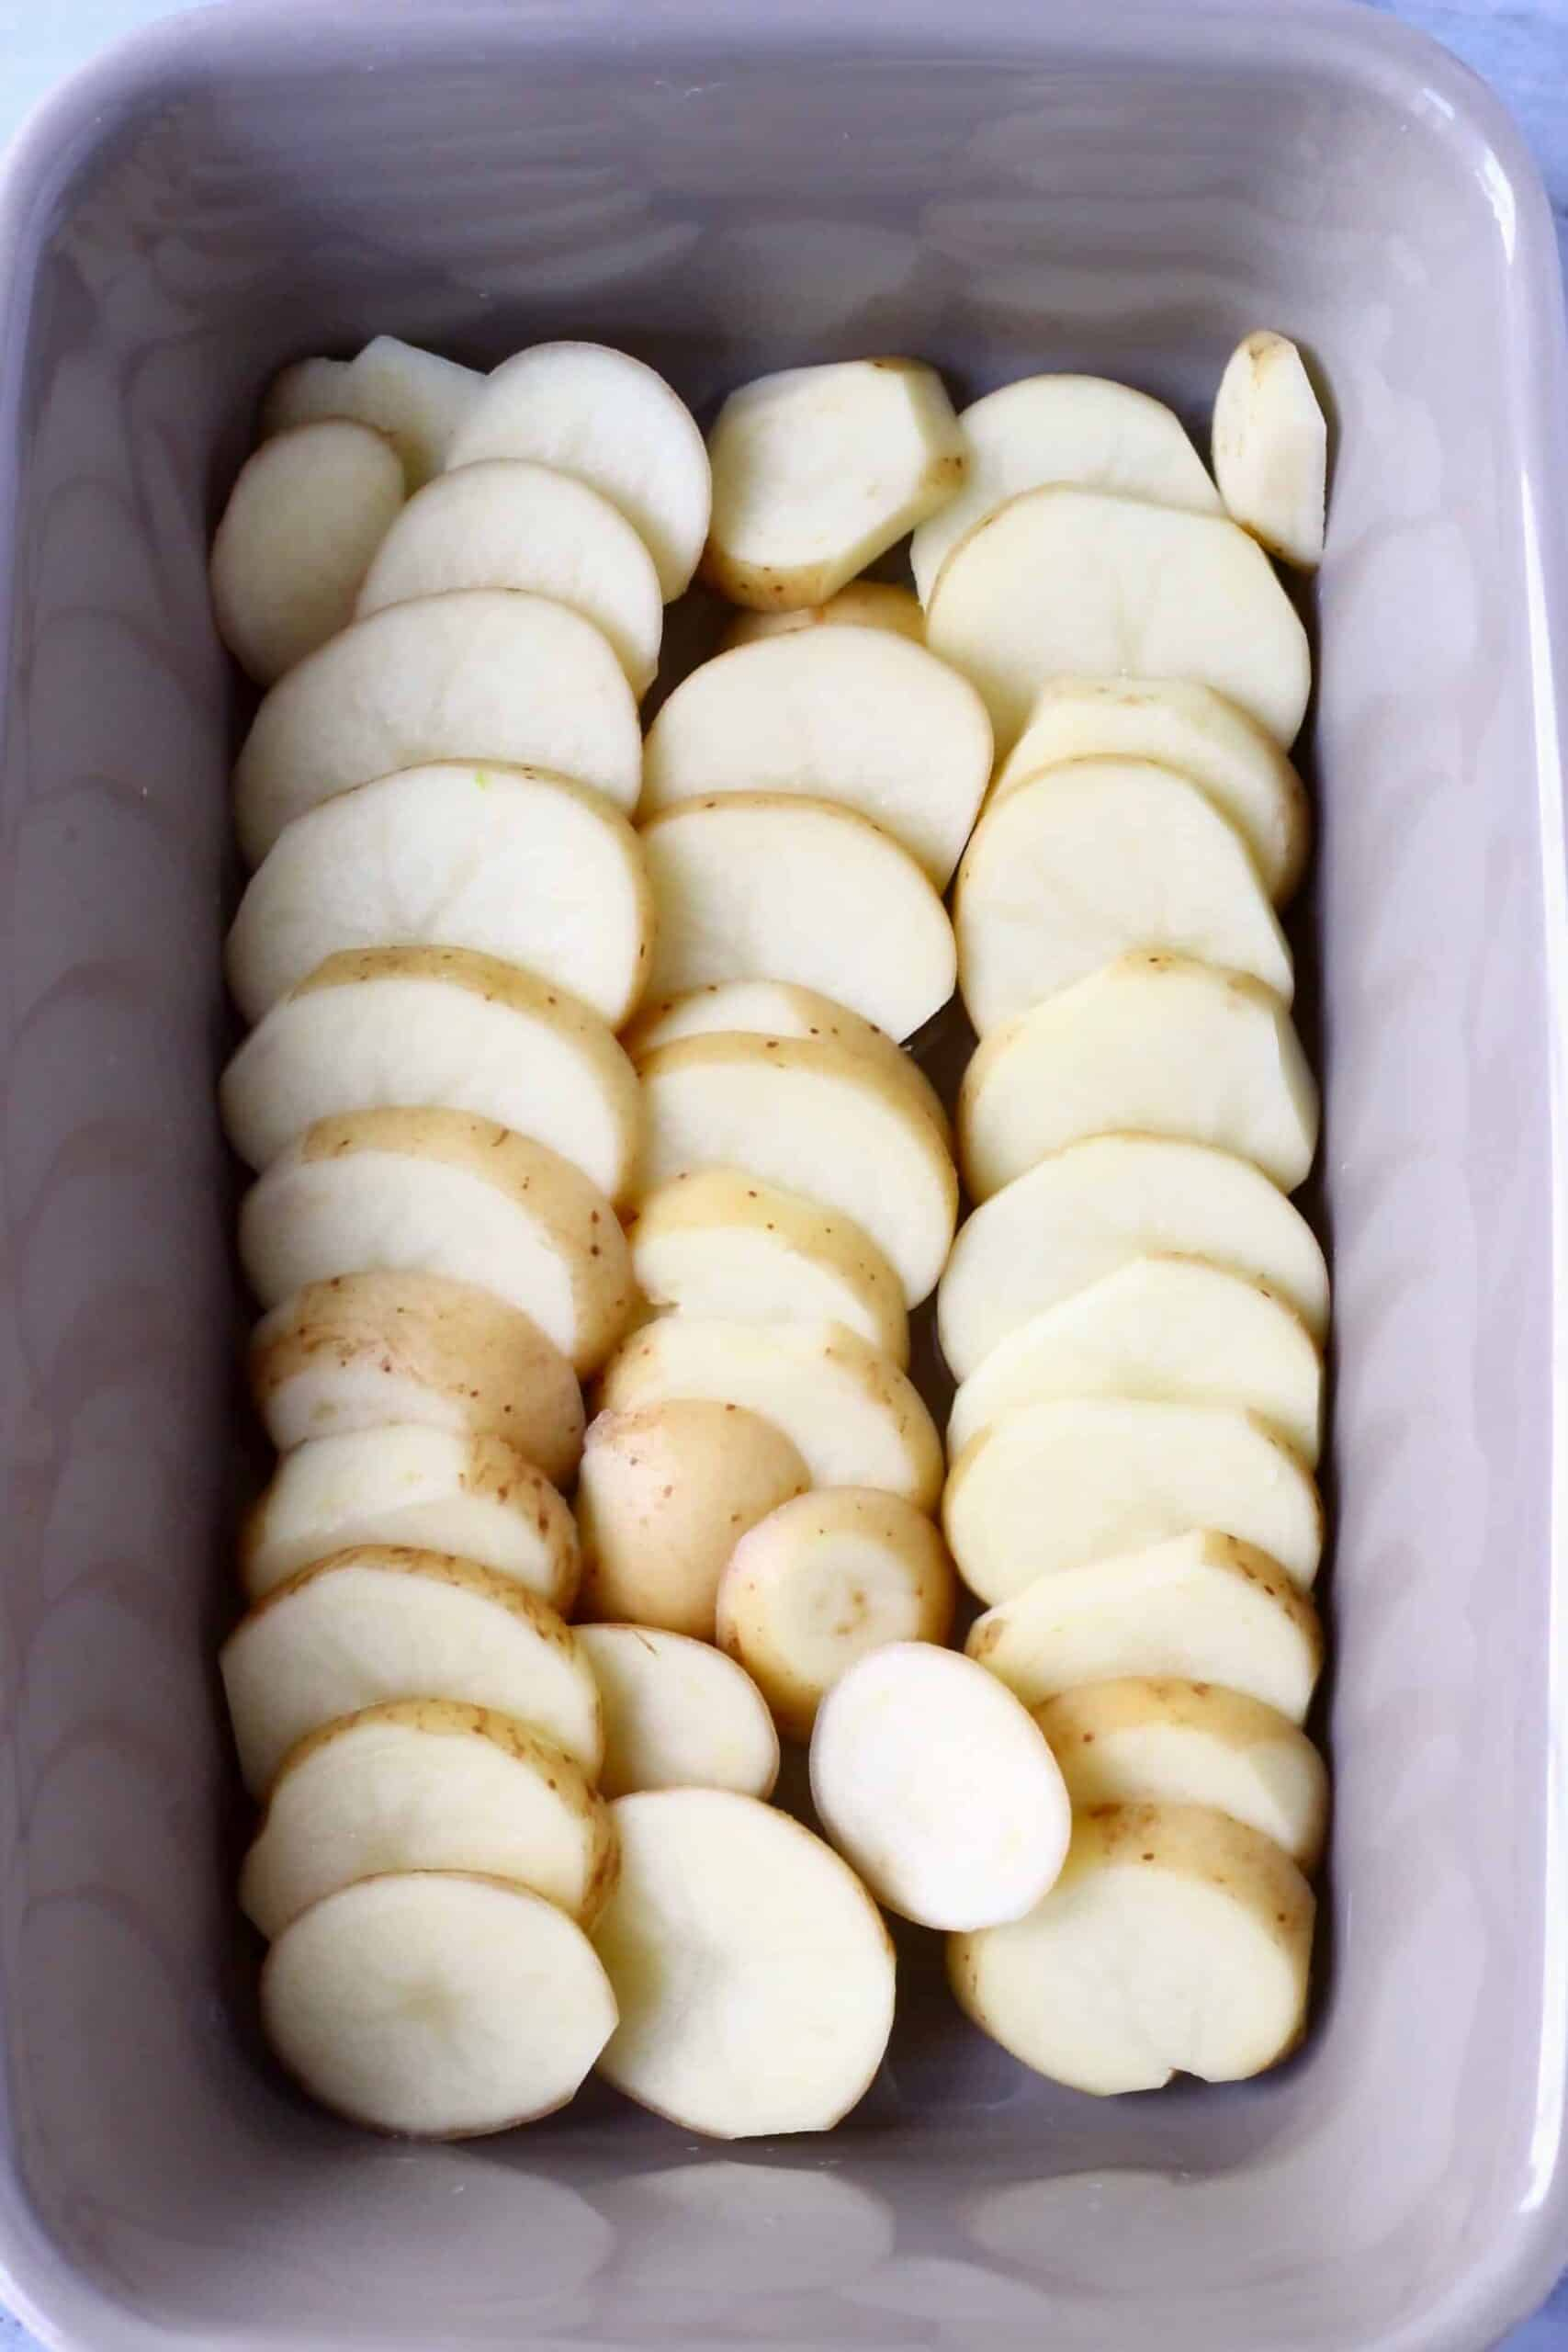 Sliced potatoes in a rectangular baking dish